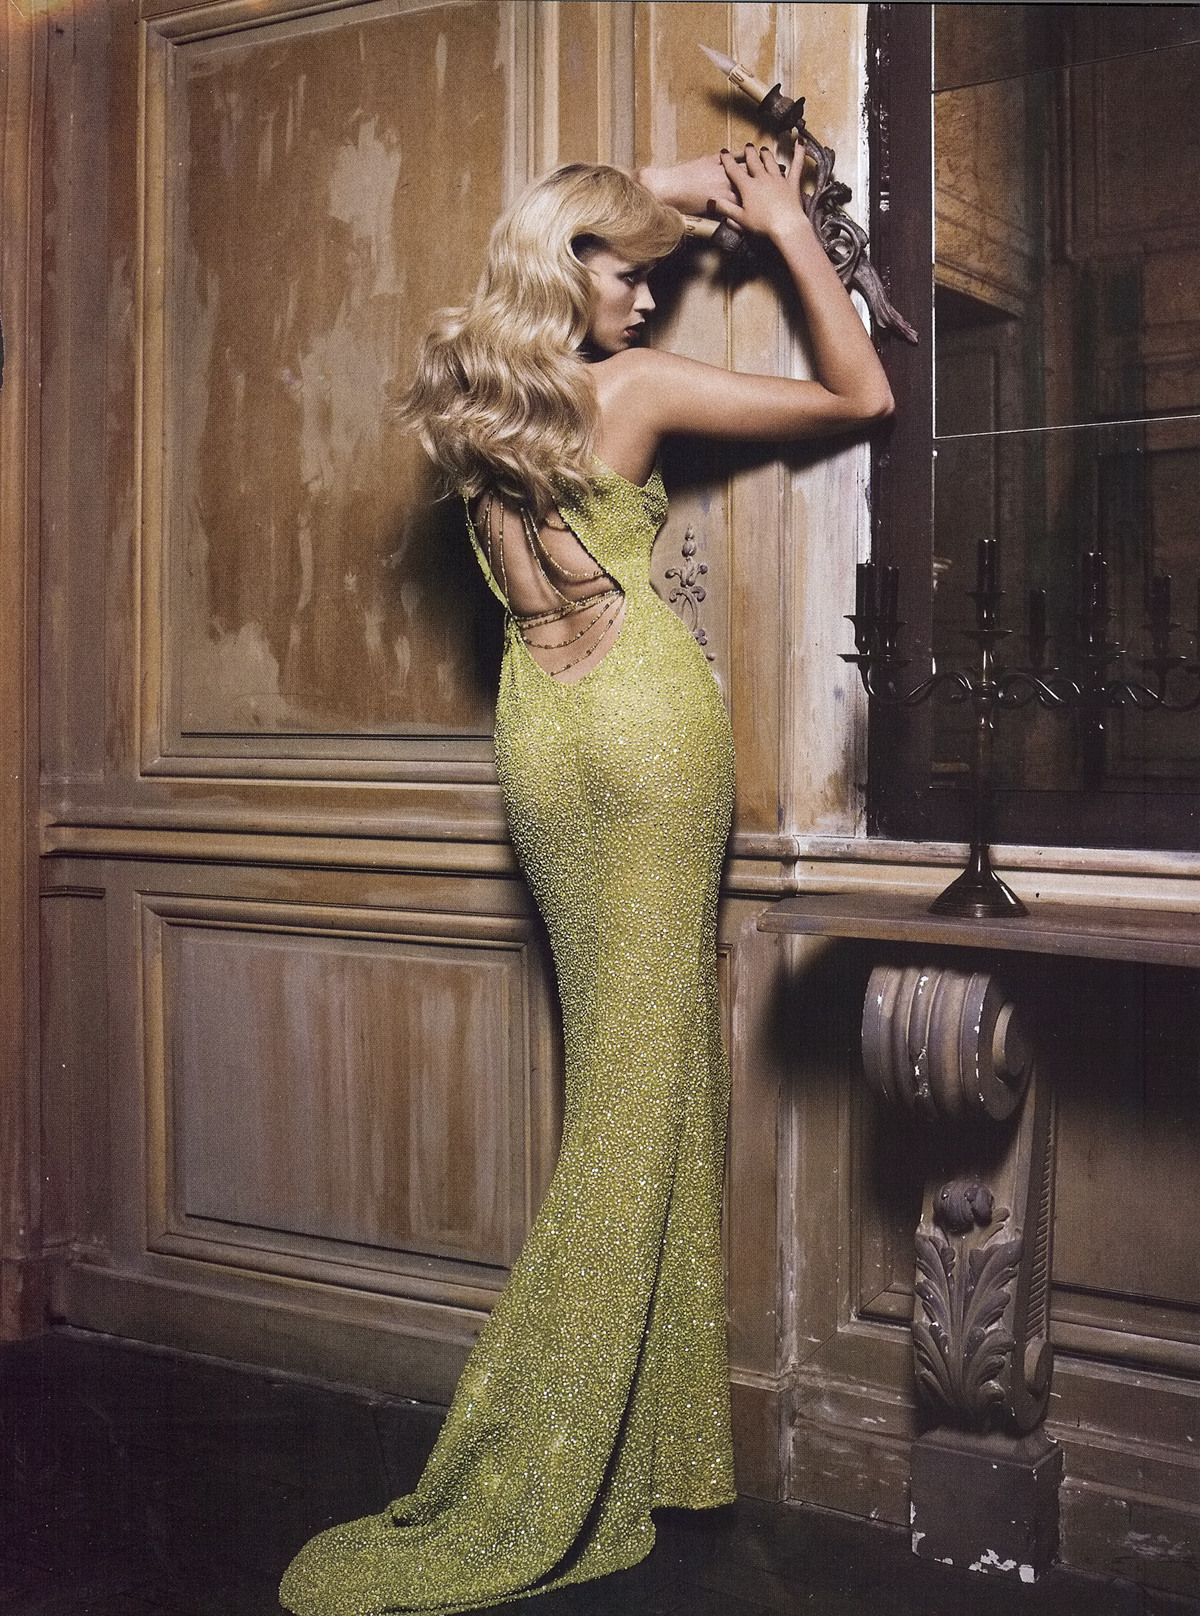 6 Annna Tokarska Emanuel Ungaro Haute Couture .jpg